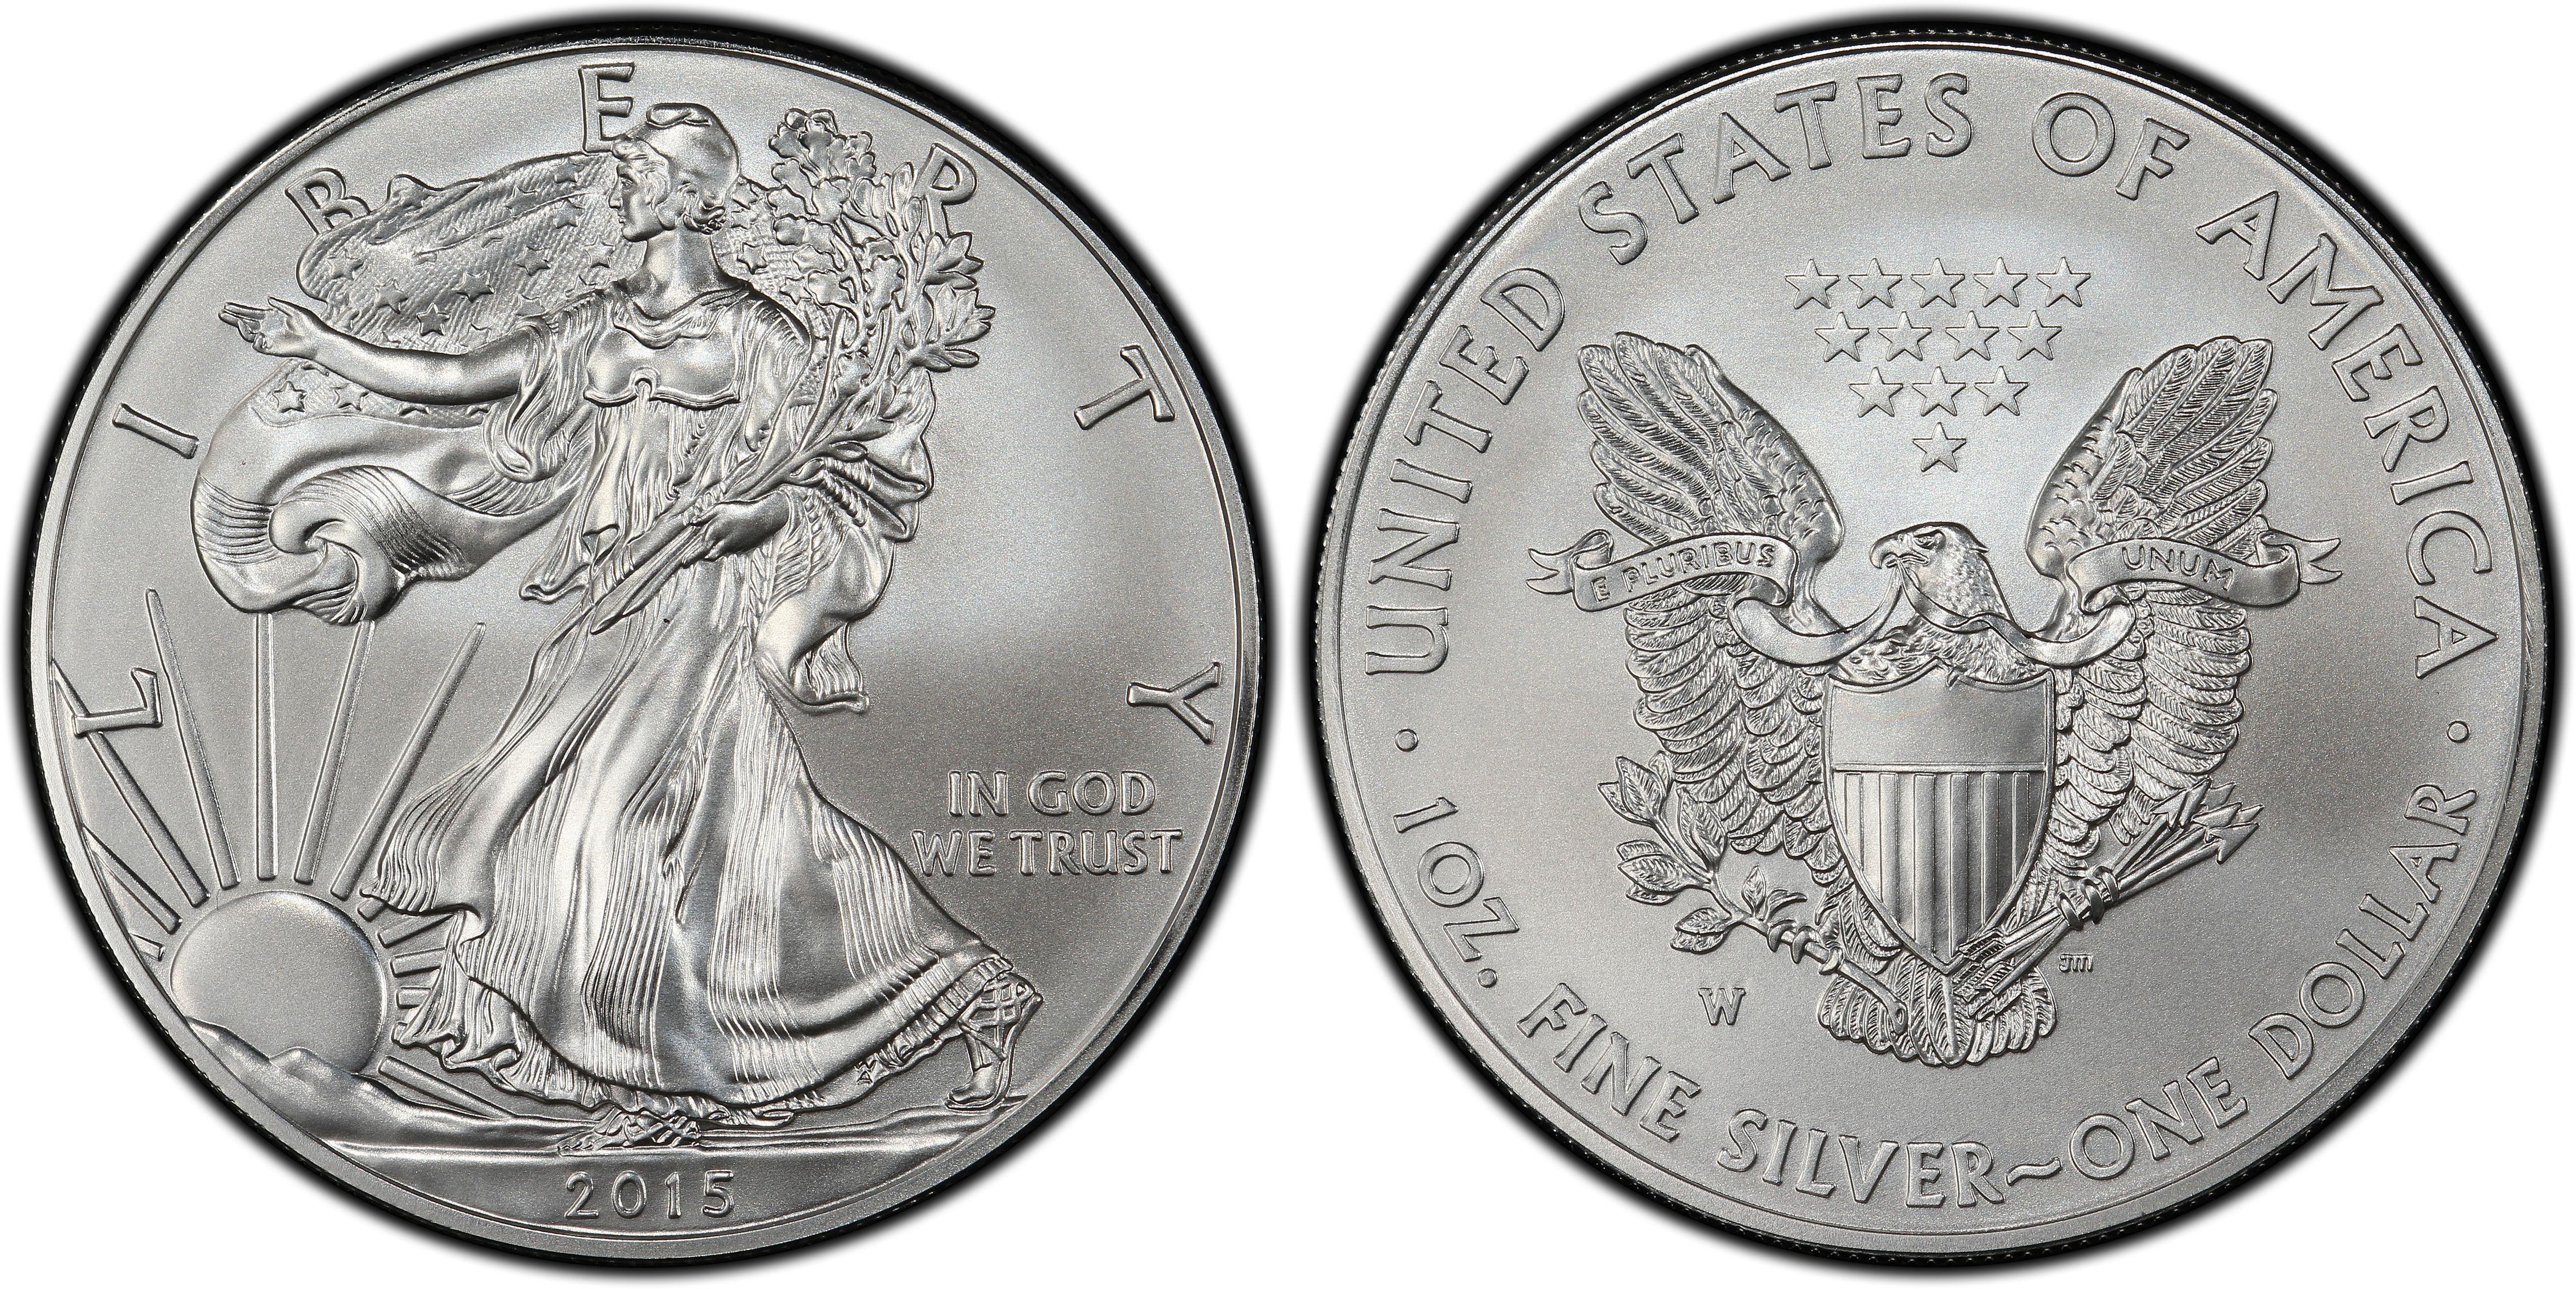 2015-W $1 Burnished Silver Eagle SP70 PCGS Thomas Cleveland Art Deco